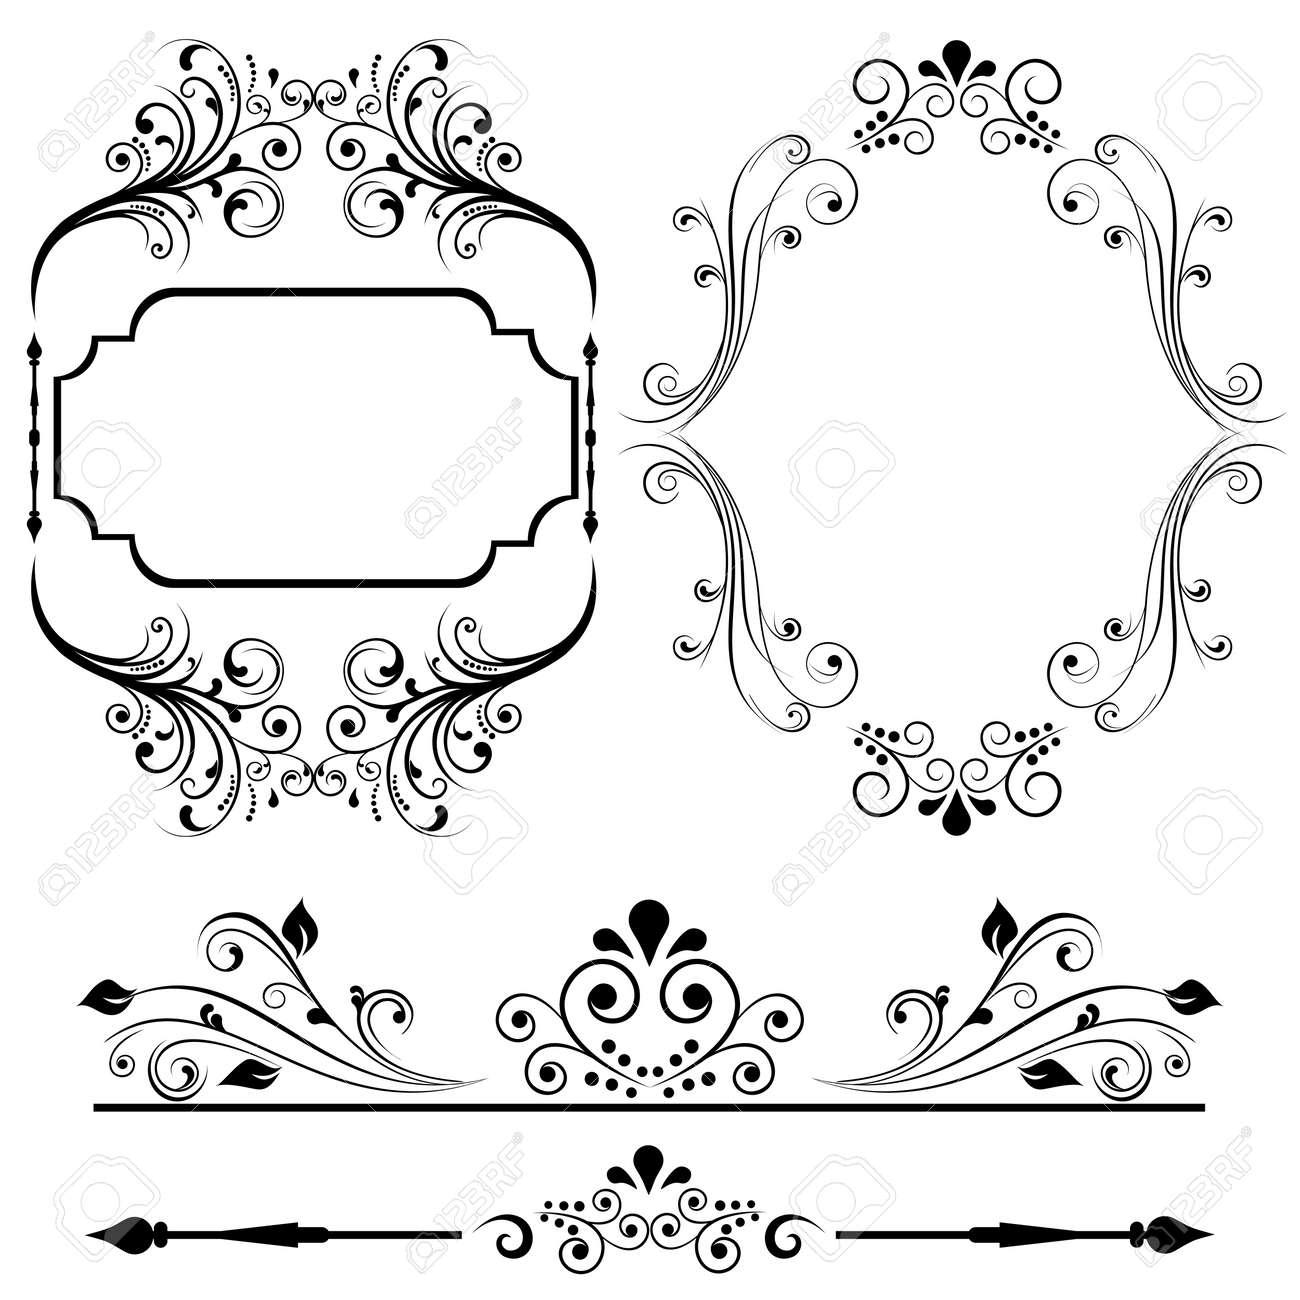 Wedding Invitation Border Design Images Certs